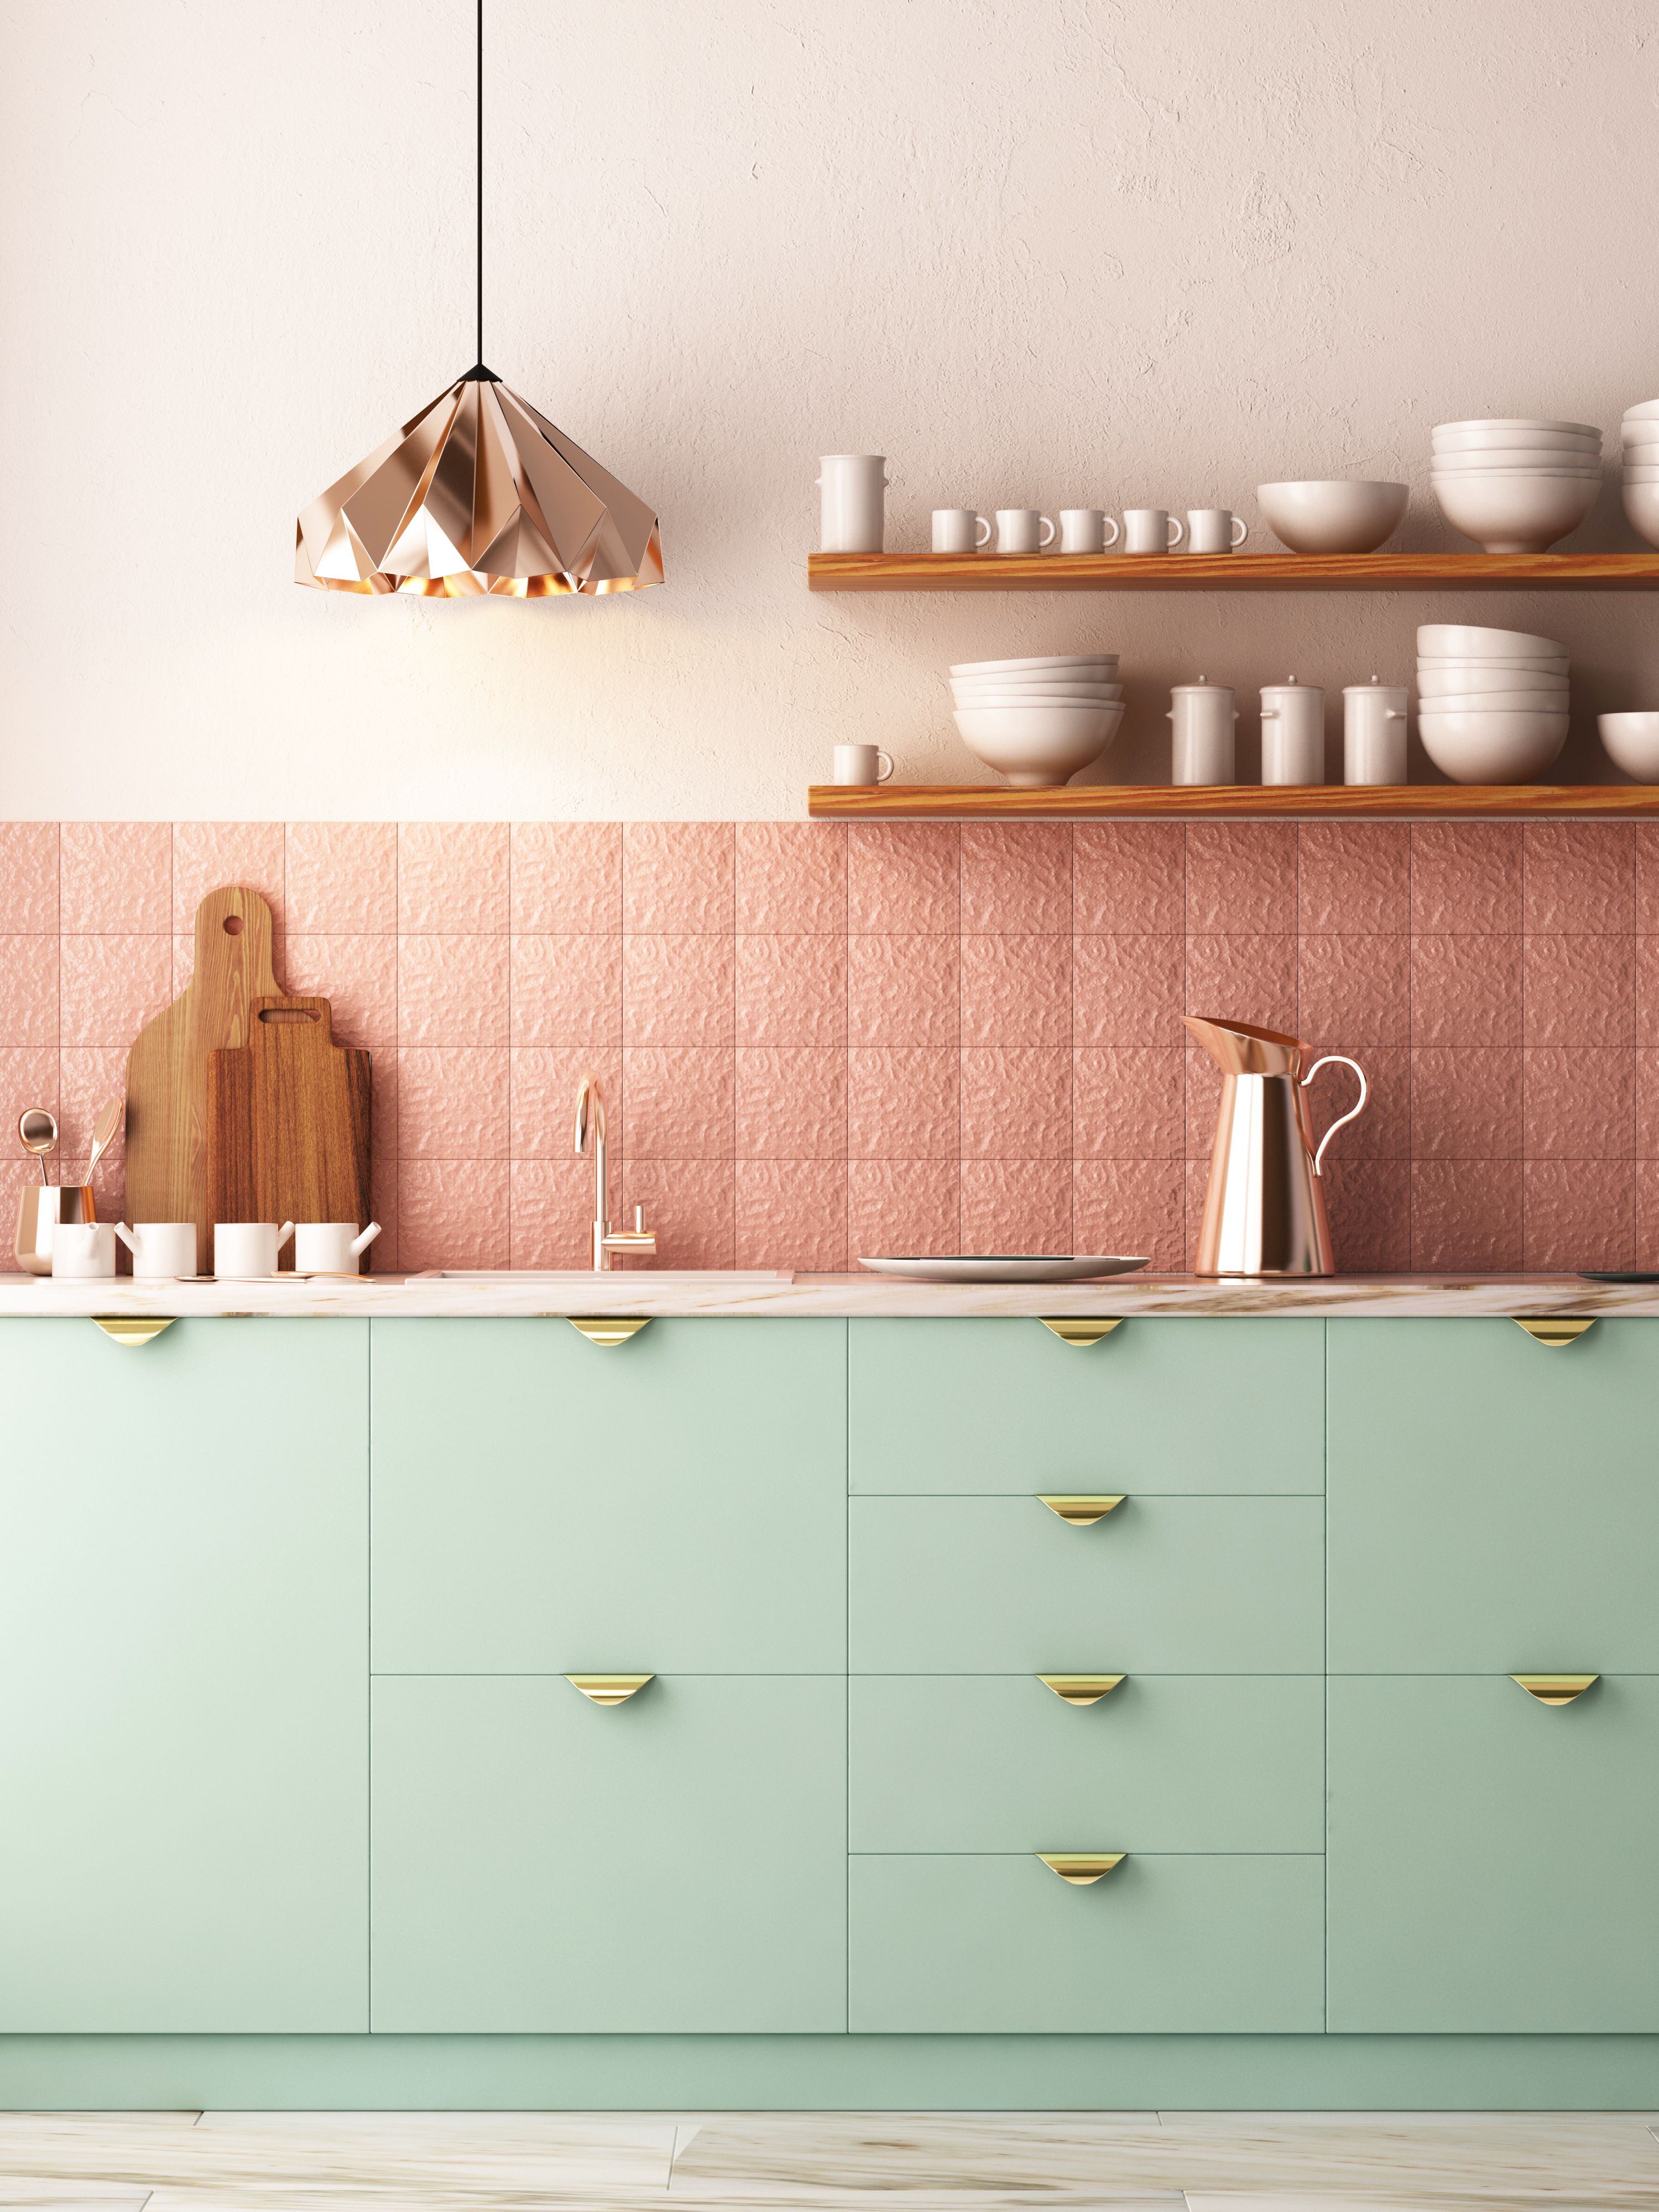 kitchen | kitchen cabinets | kitchen cabinet colors | cabinet colors | countertop | kitchen countertop | kitchen cabinet trends | kitchen countertop trends